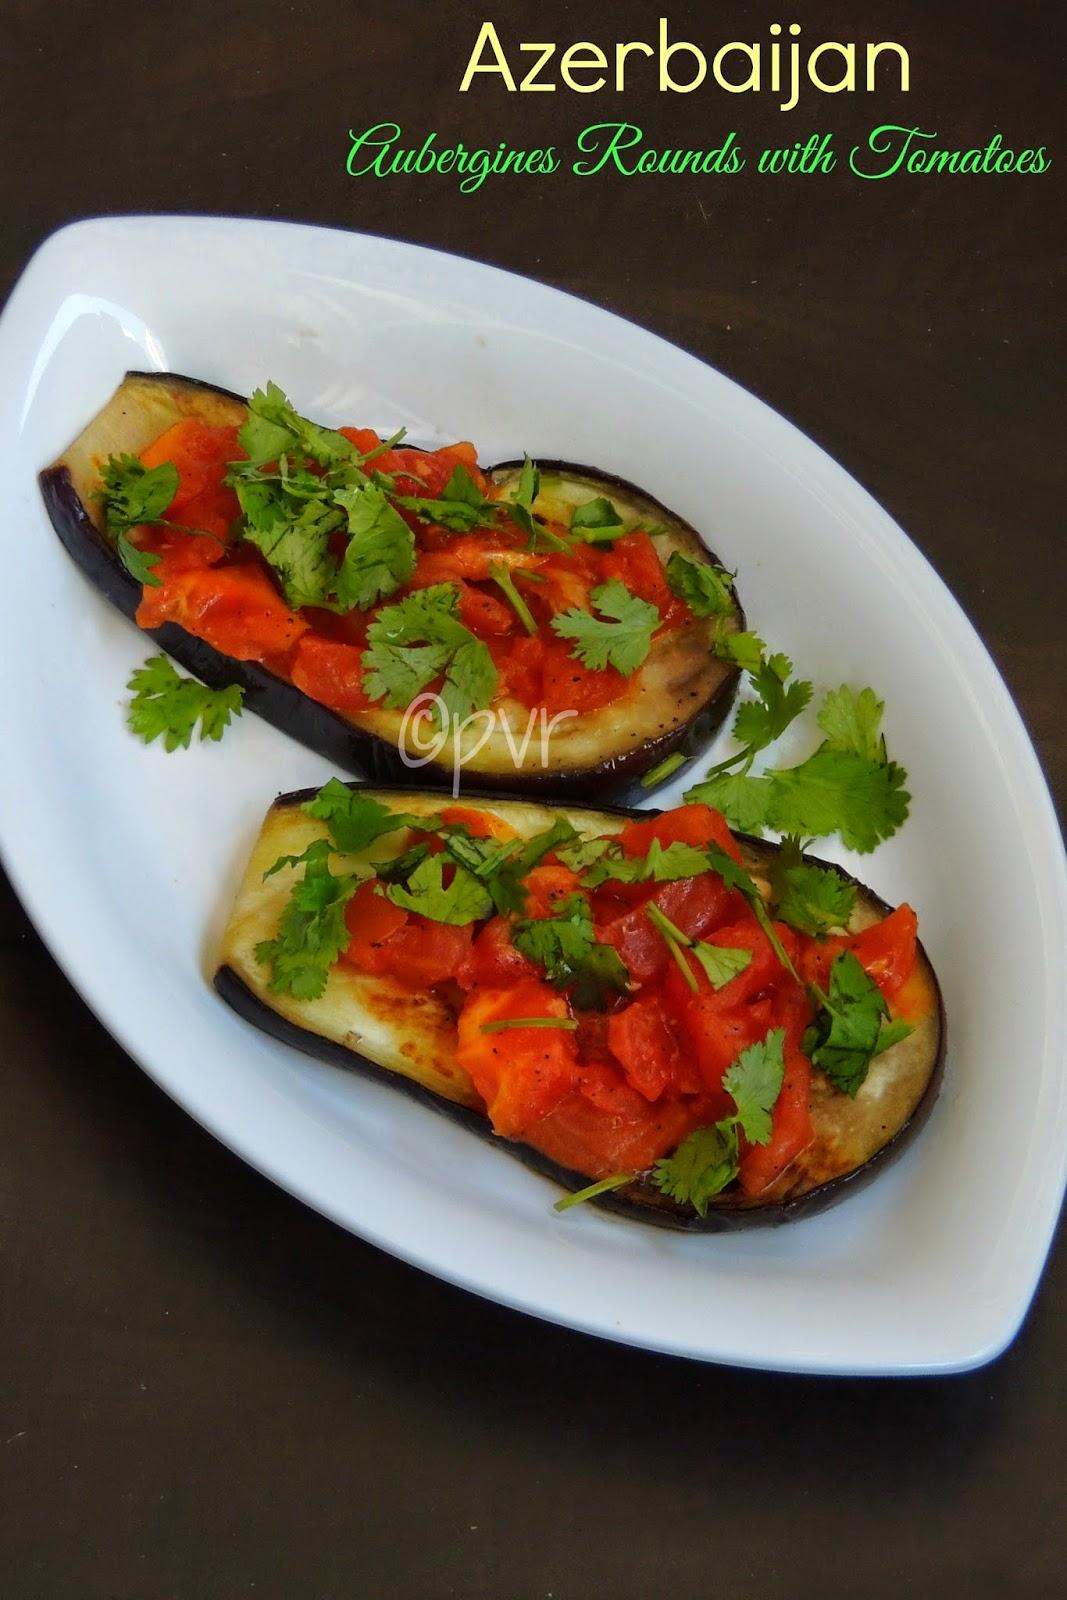 Badimjan Dilchaklari,Aubergines Rounds with Tomatoes,Azerbaijani Aubergines rounds